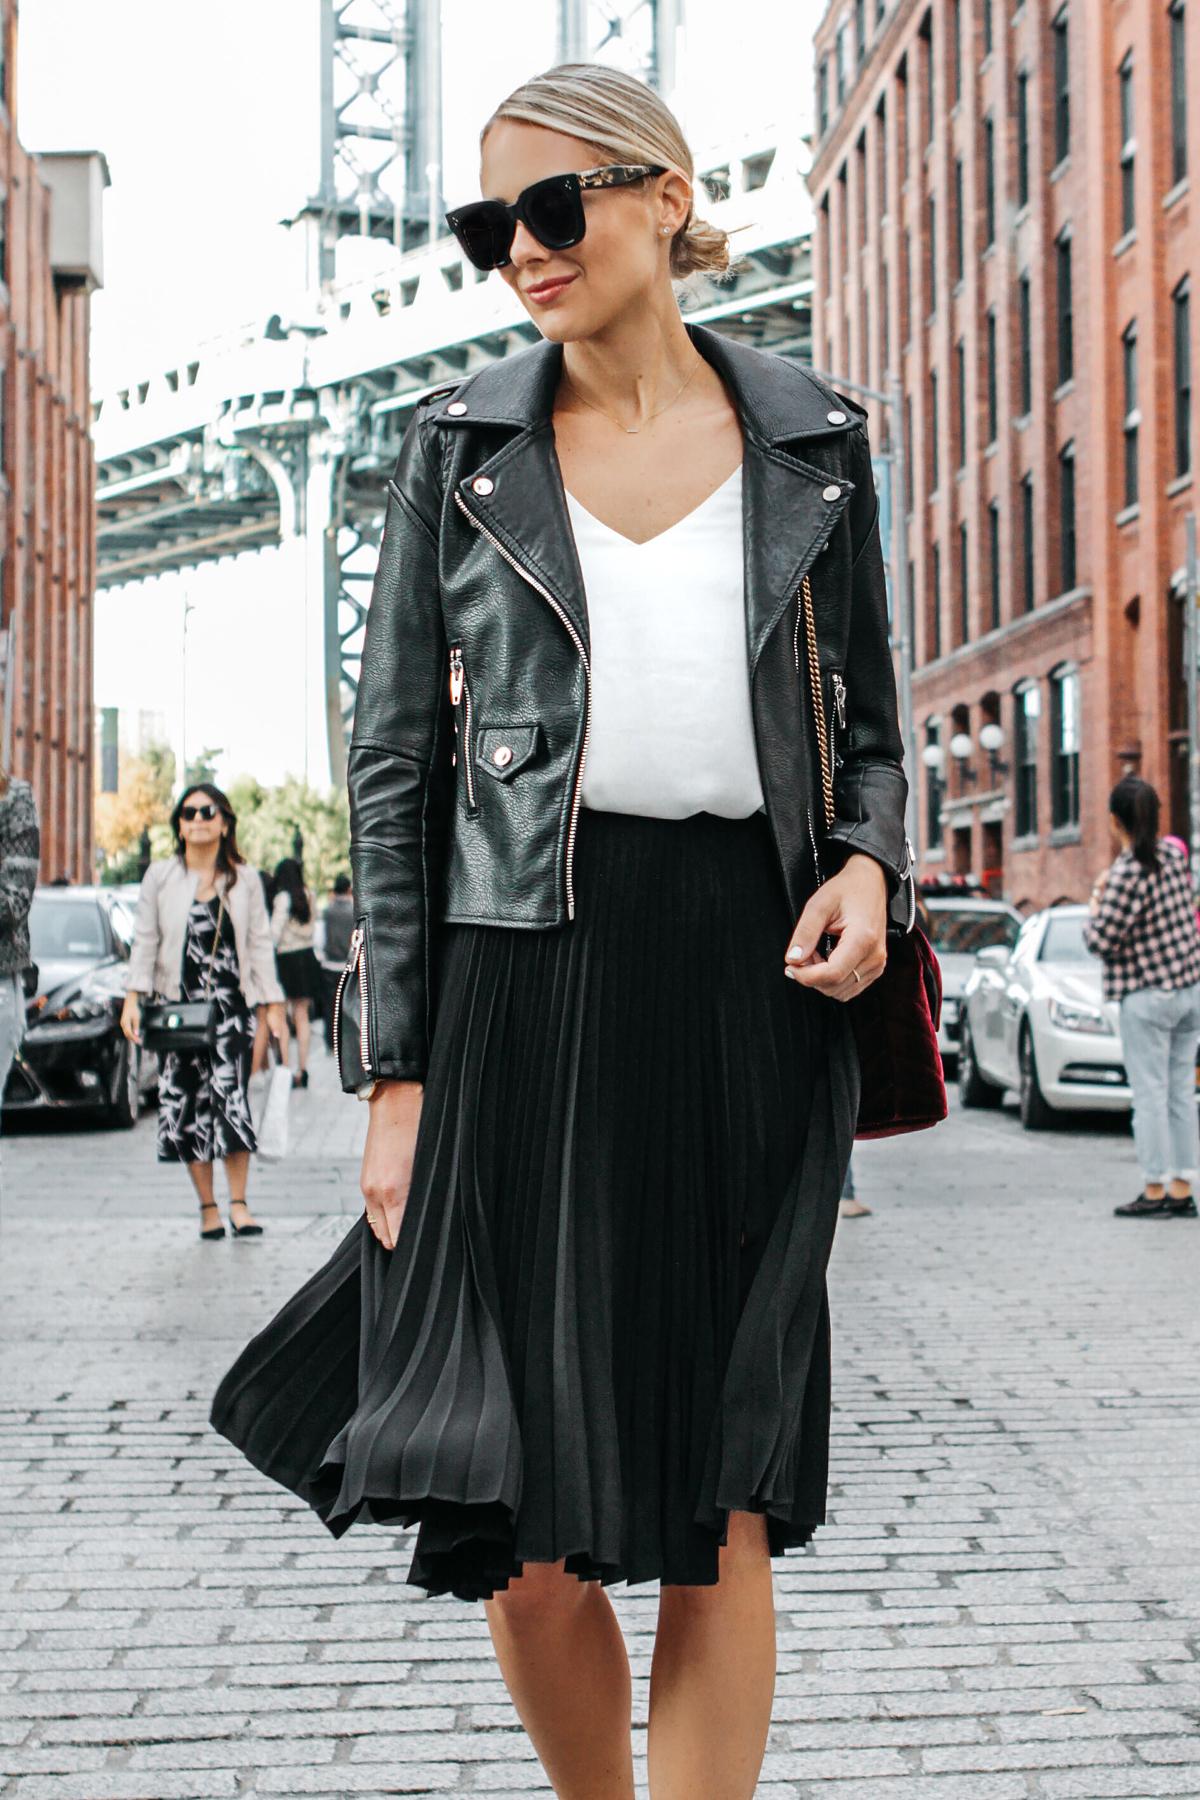 Blonde Woman Wearing Black Leather Jacket Black Pleated Midi Skirt Saint Laurent Burgundy Velvet Bag Fashion Jackson Dallas Blogger Fashion Blogger Street Style NYFW Dumbo Bridge